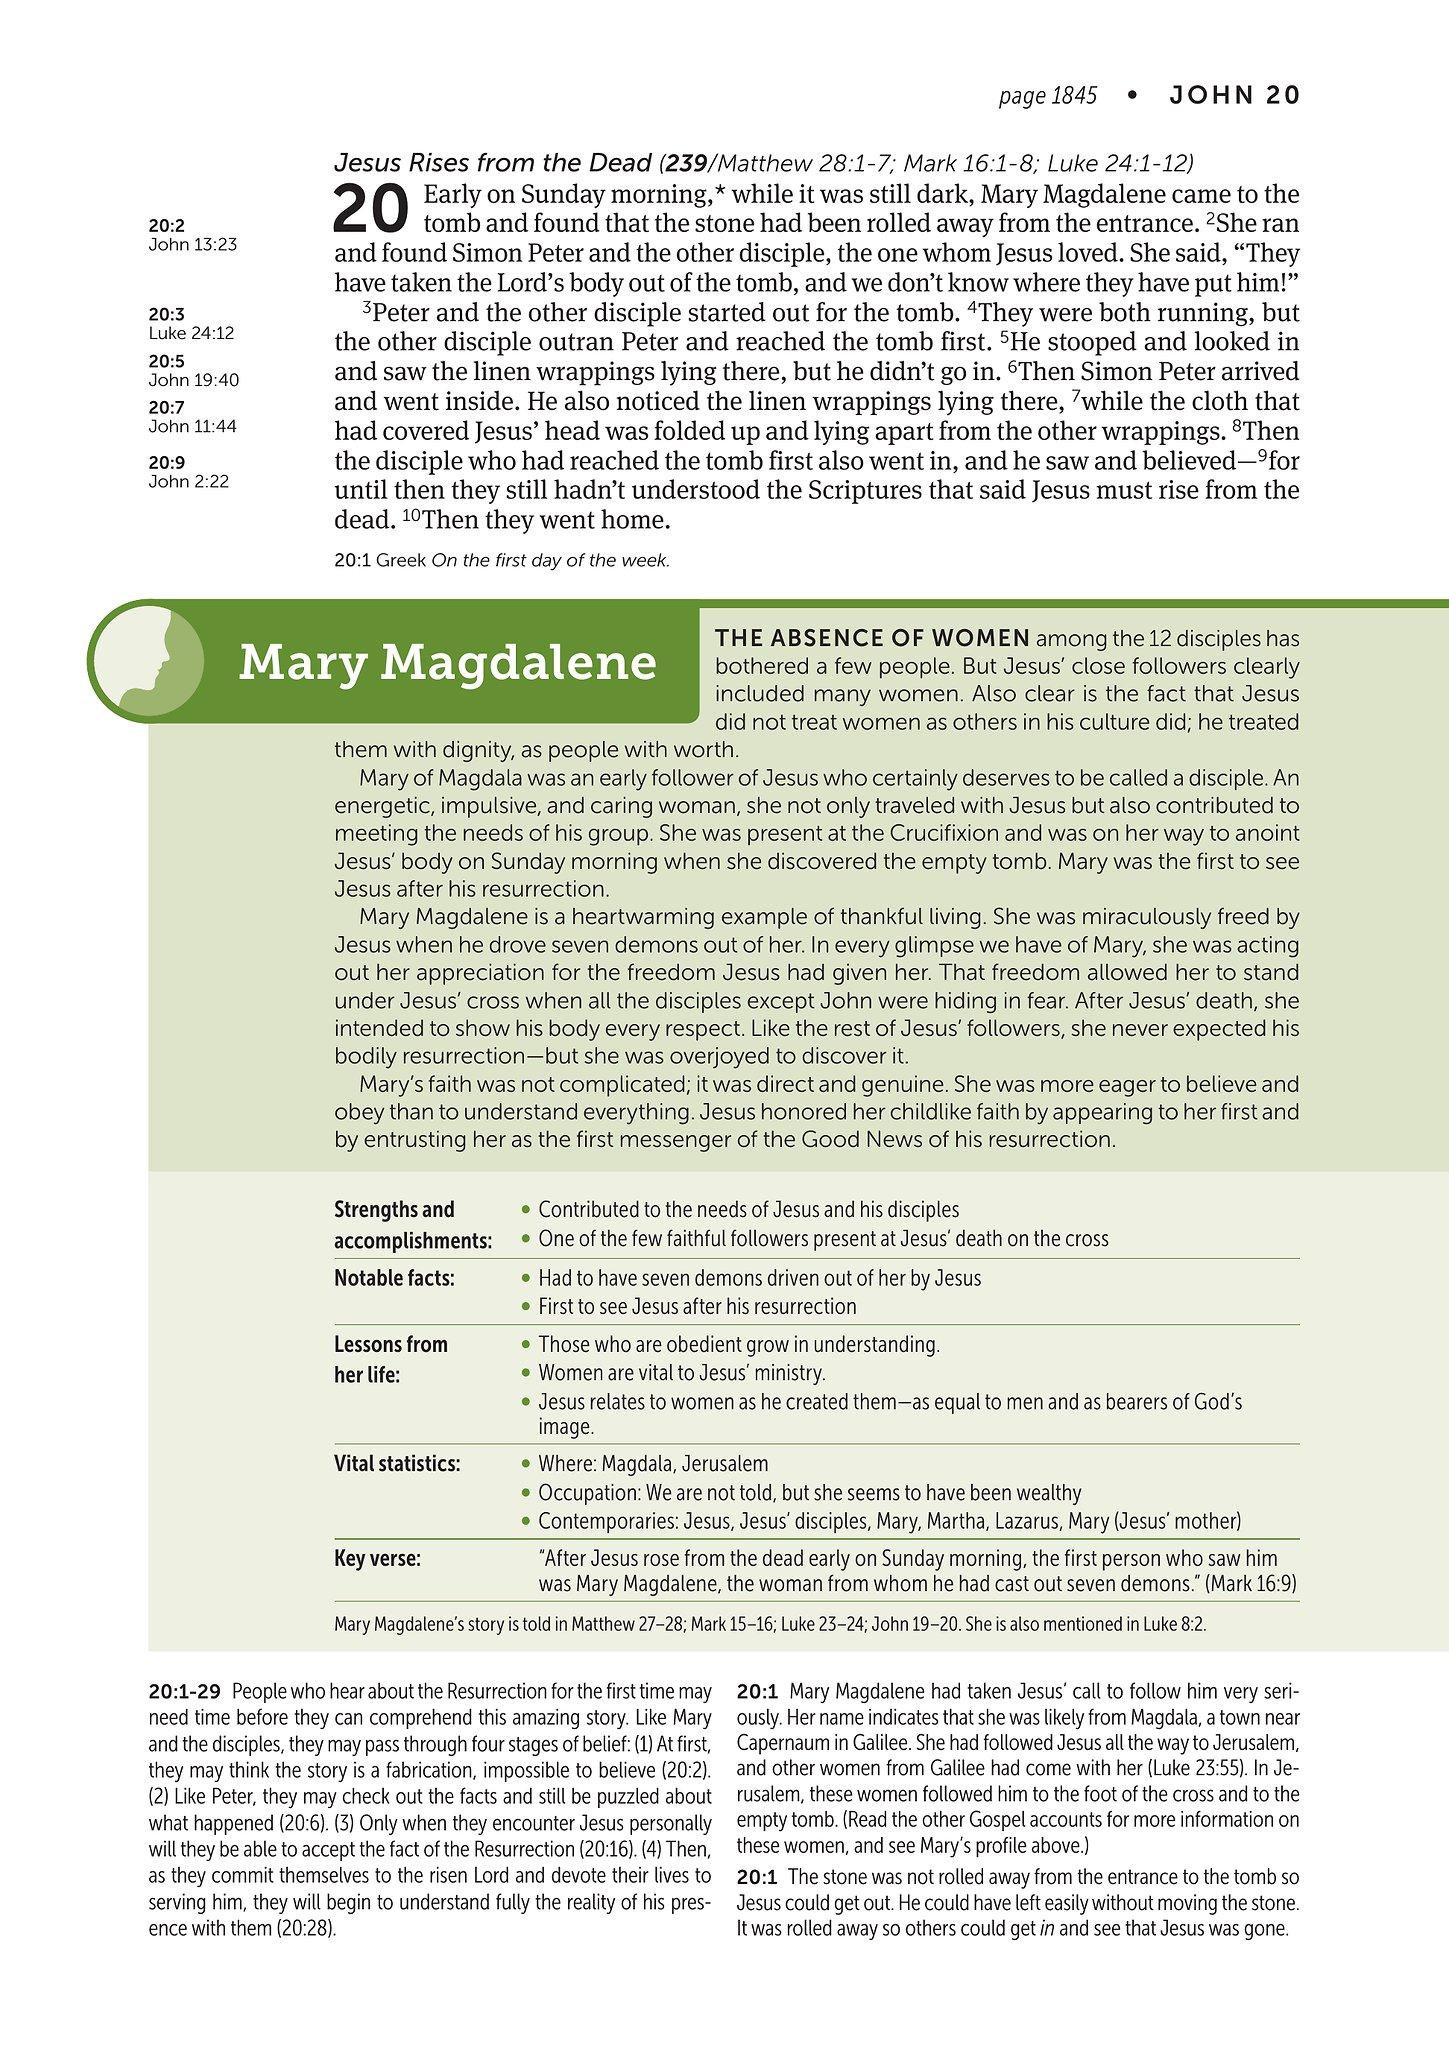 Life Application Study Bible 3rd Edition NLT - Flipbook